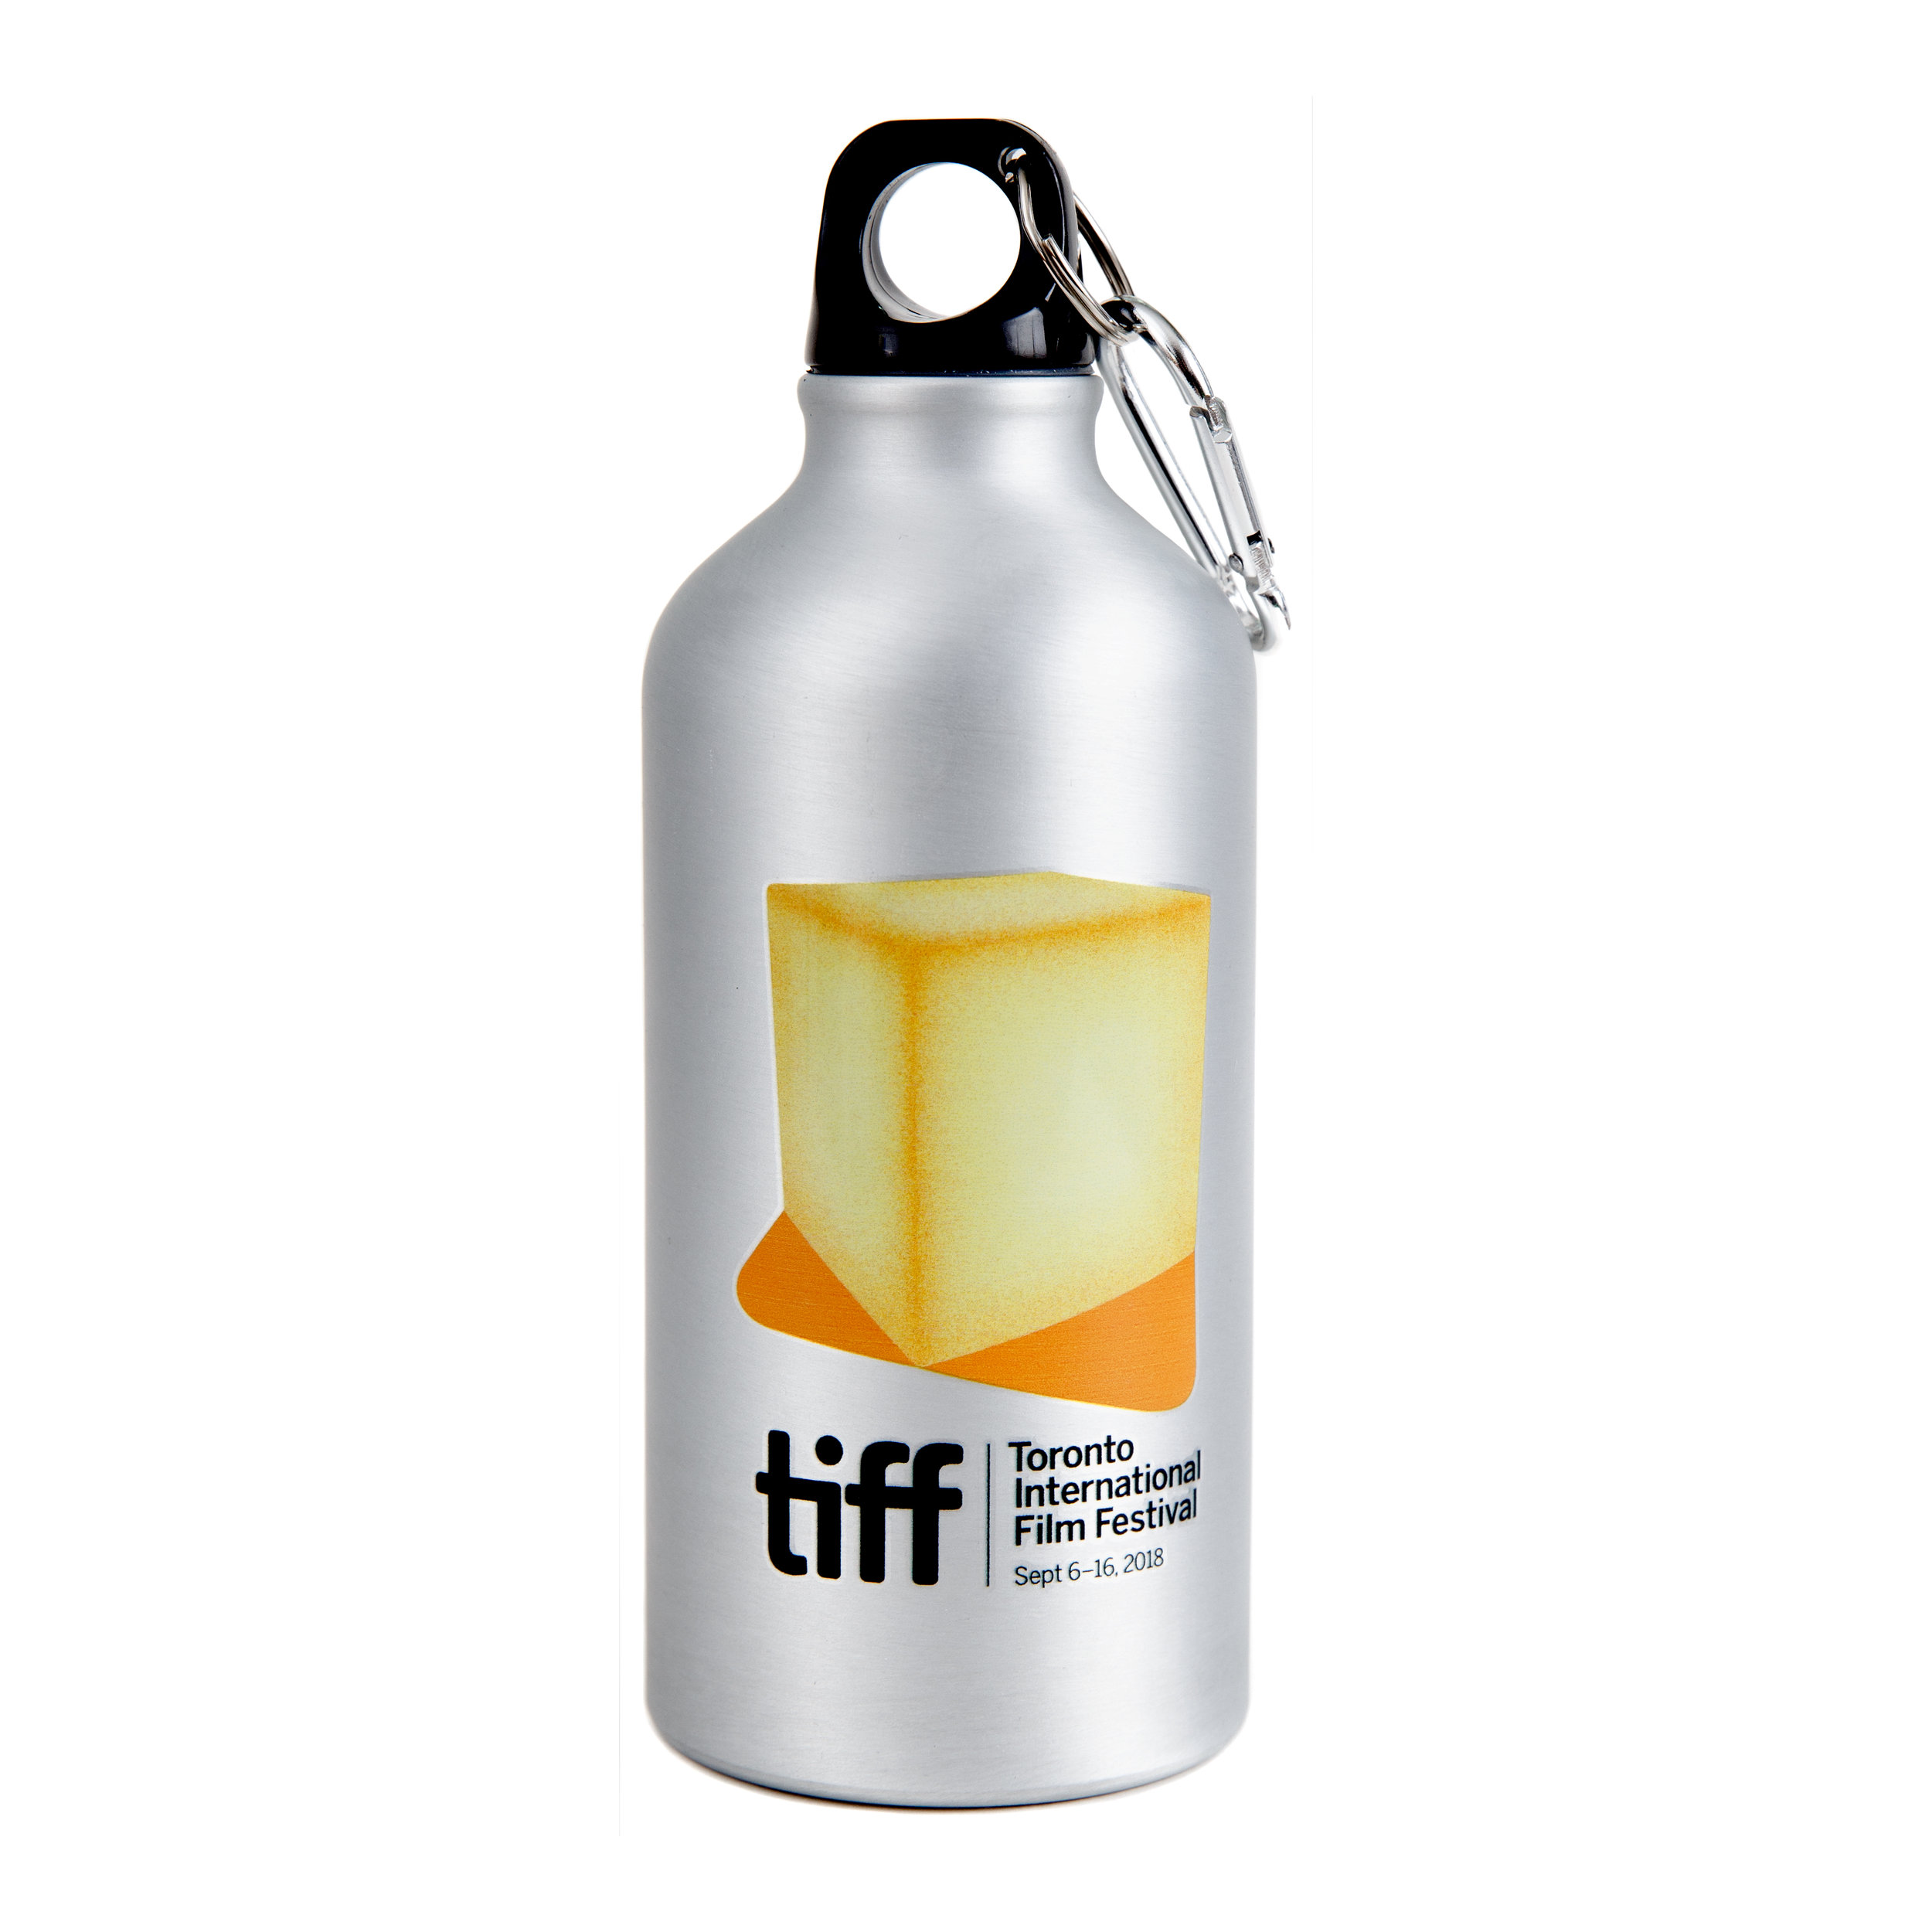 tiff bottle